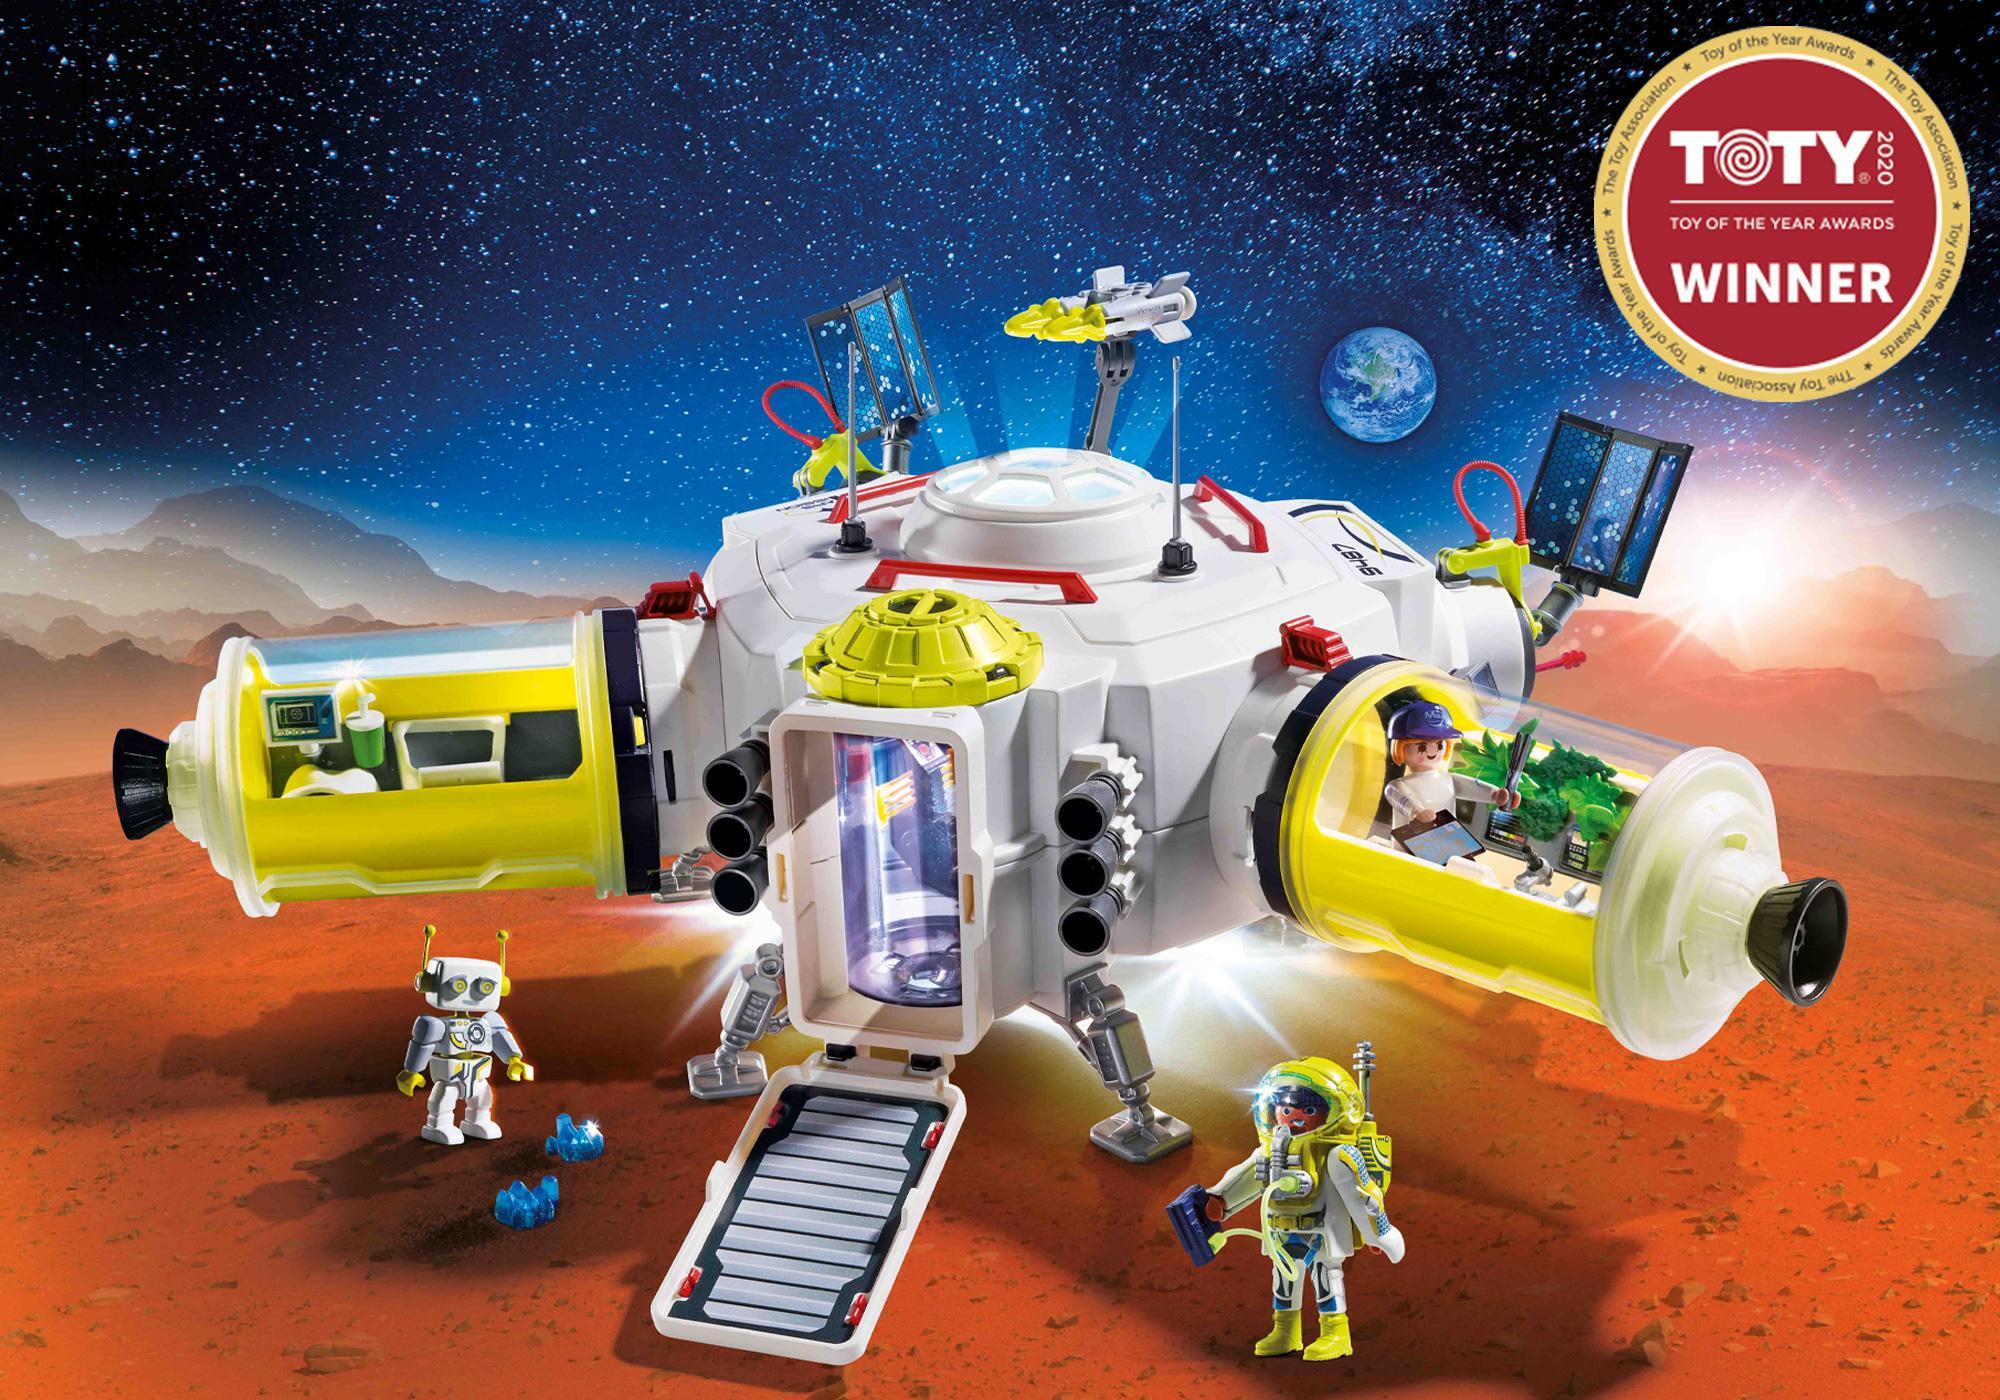 http://media.playmobil.com/i/playmobil/9487_product_detail/Marsstation